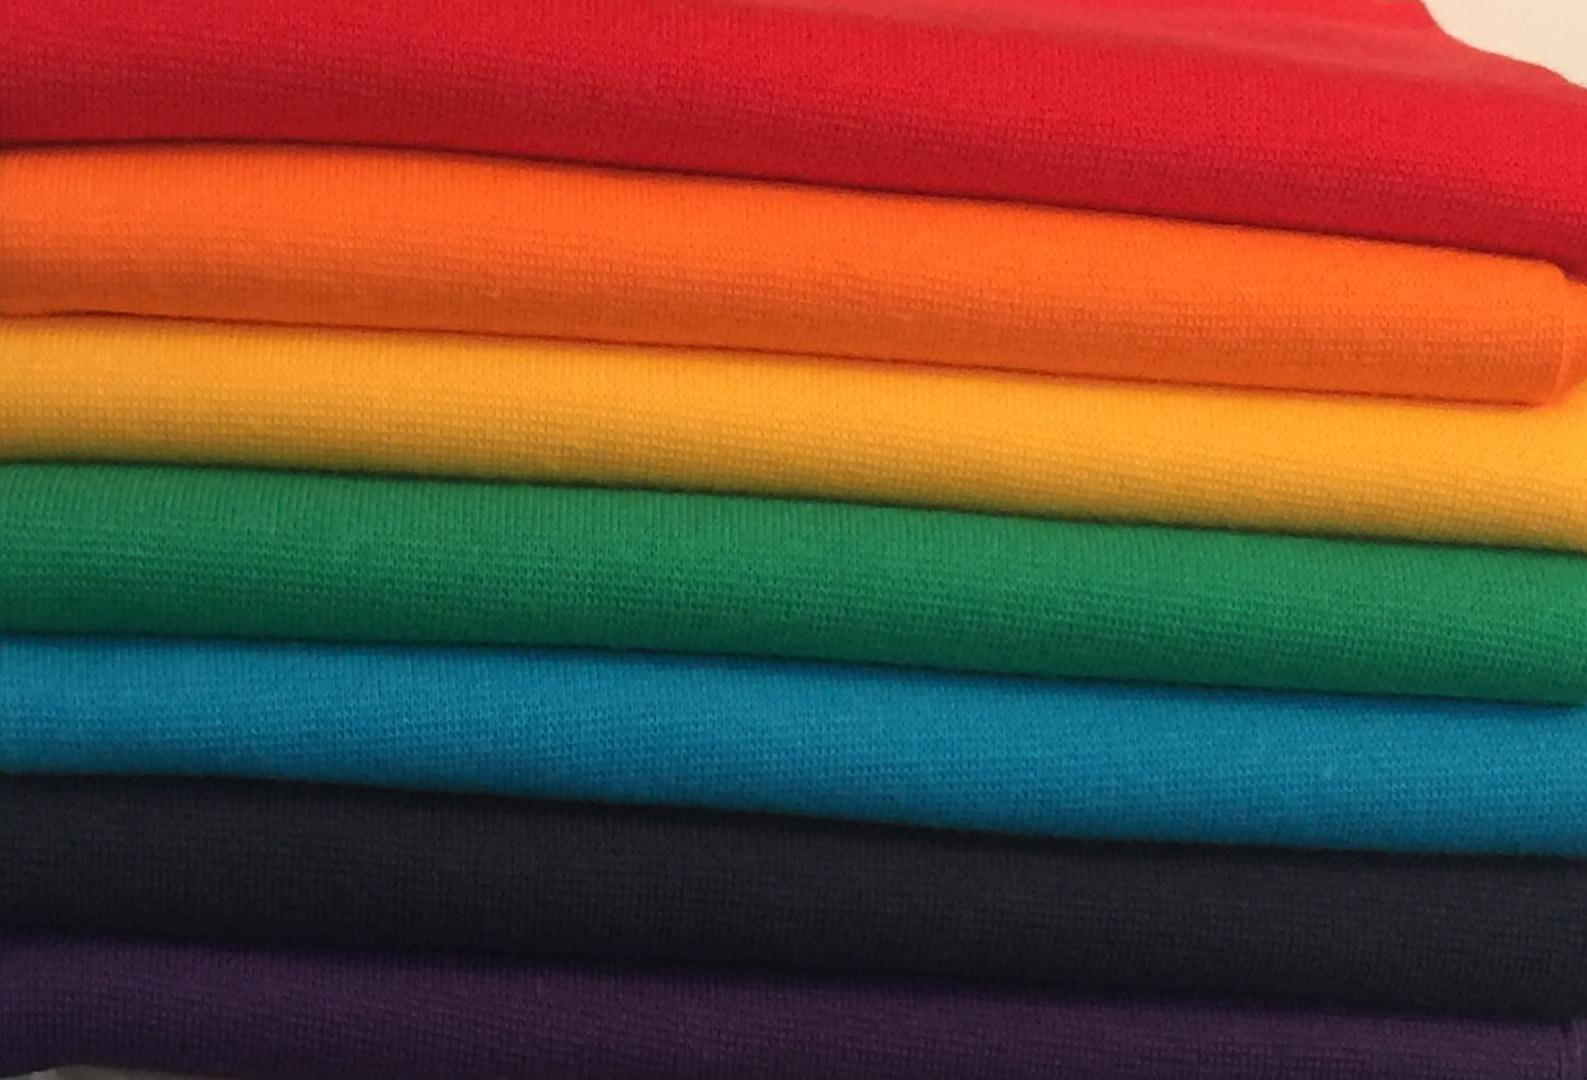 Regenbogen Bündchen Paket 7 x 50